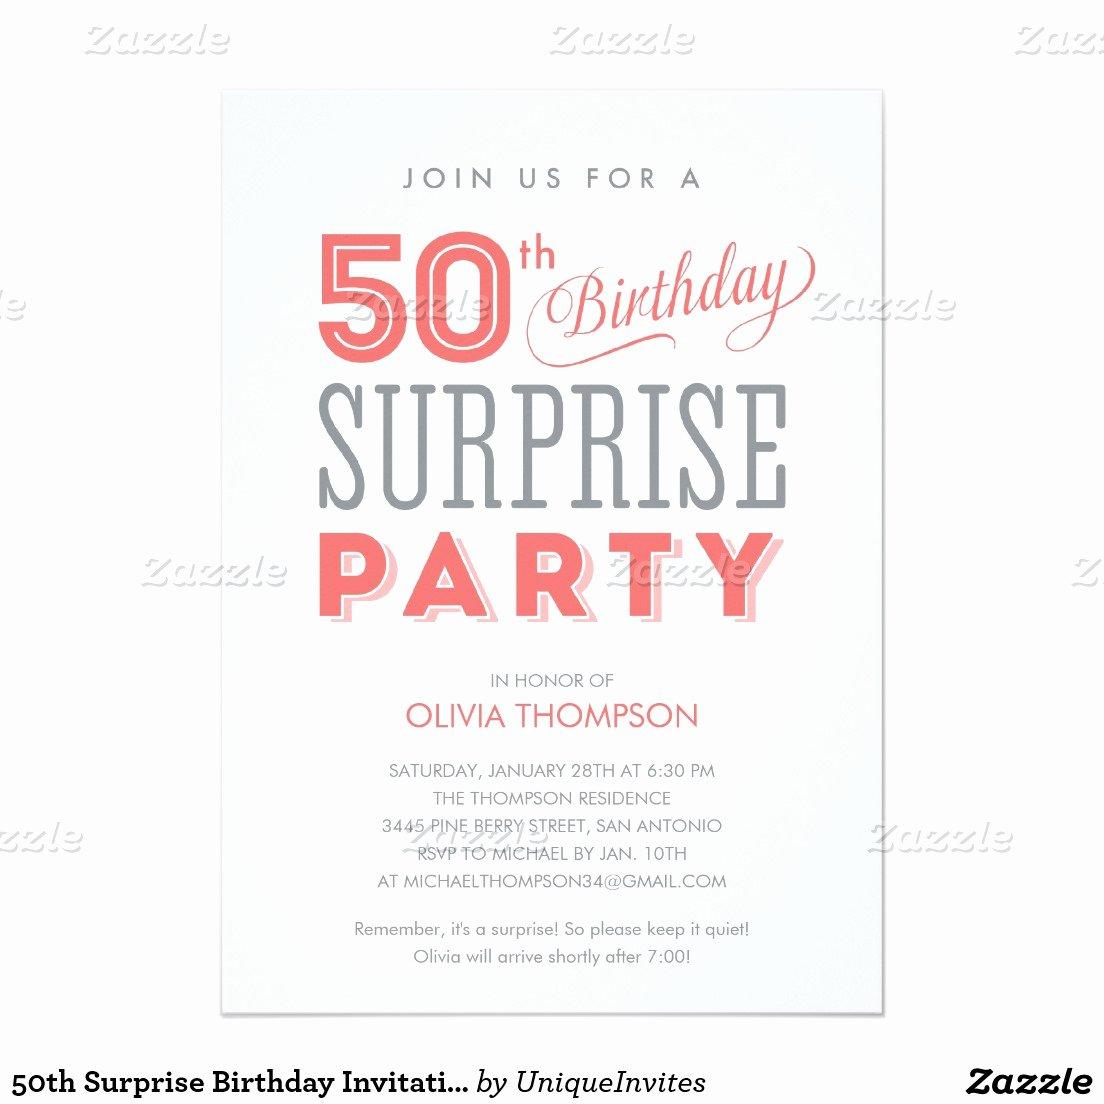 Surprise 50th Birthday Party Invitation Wording